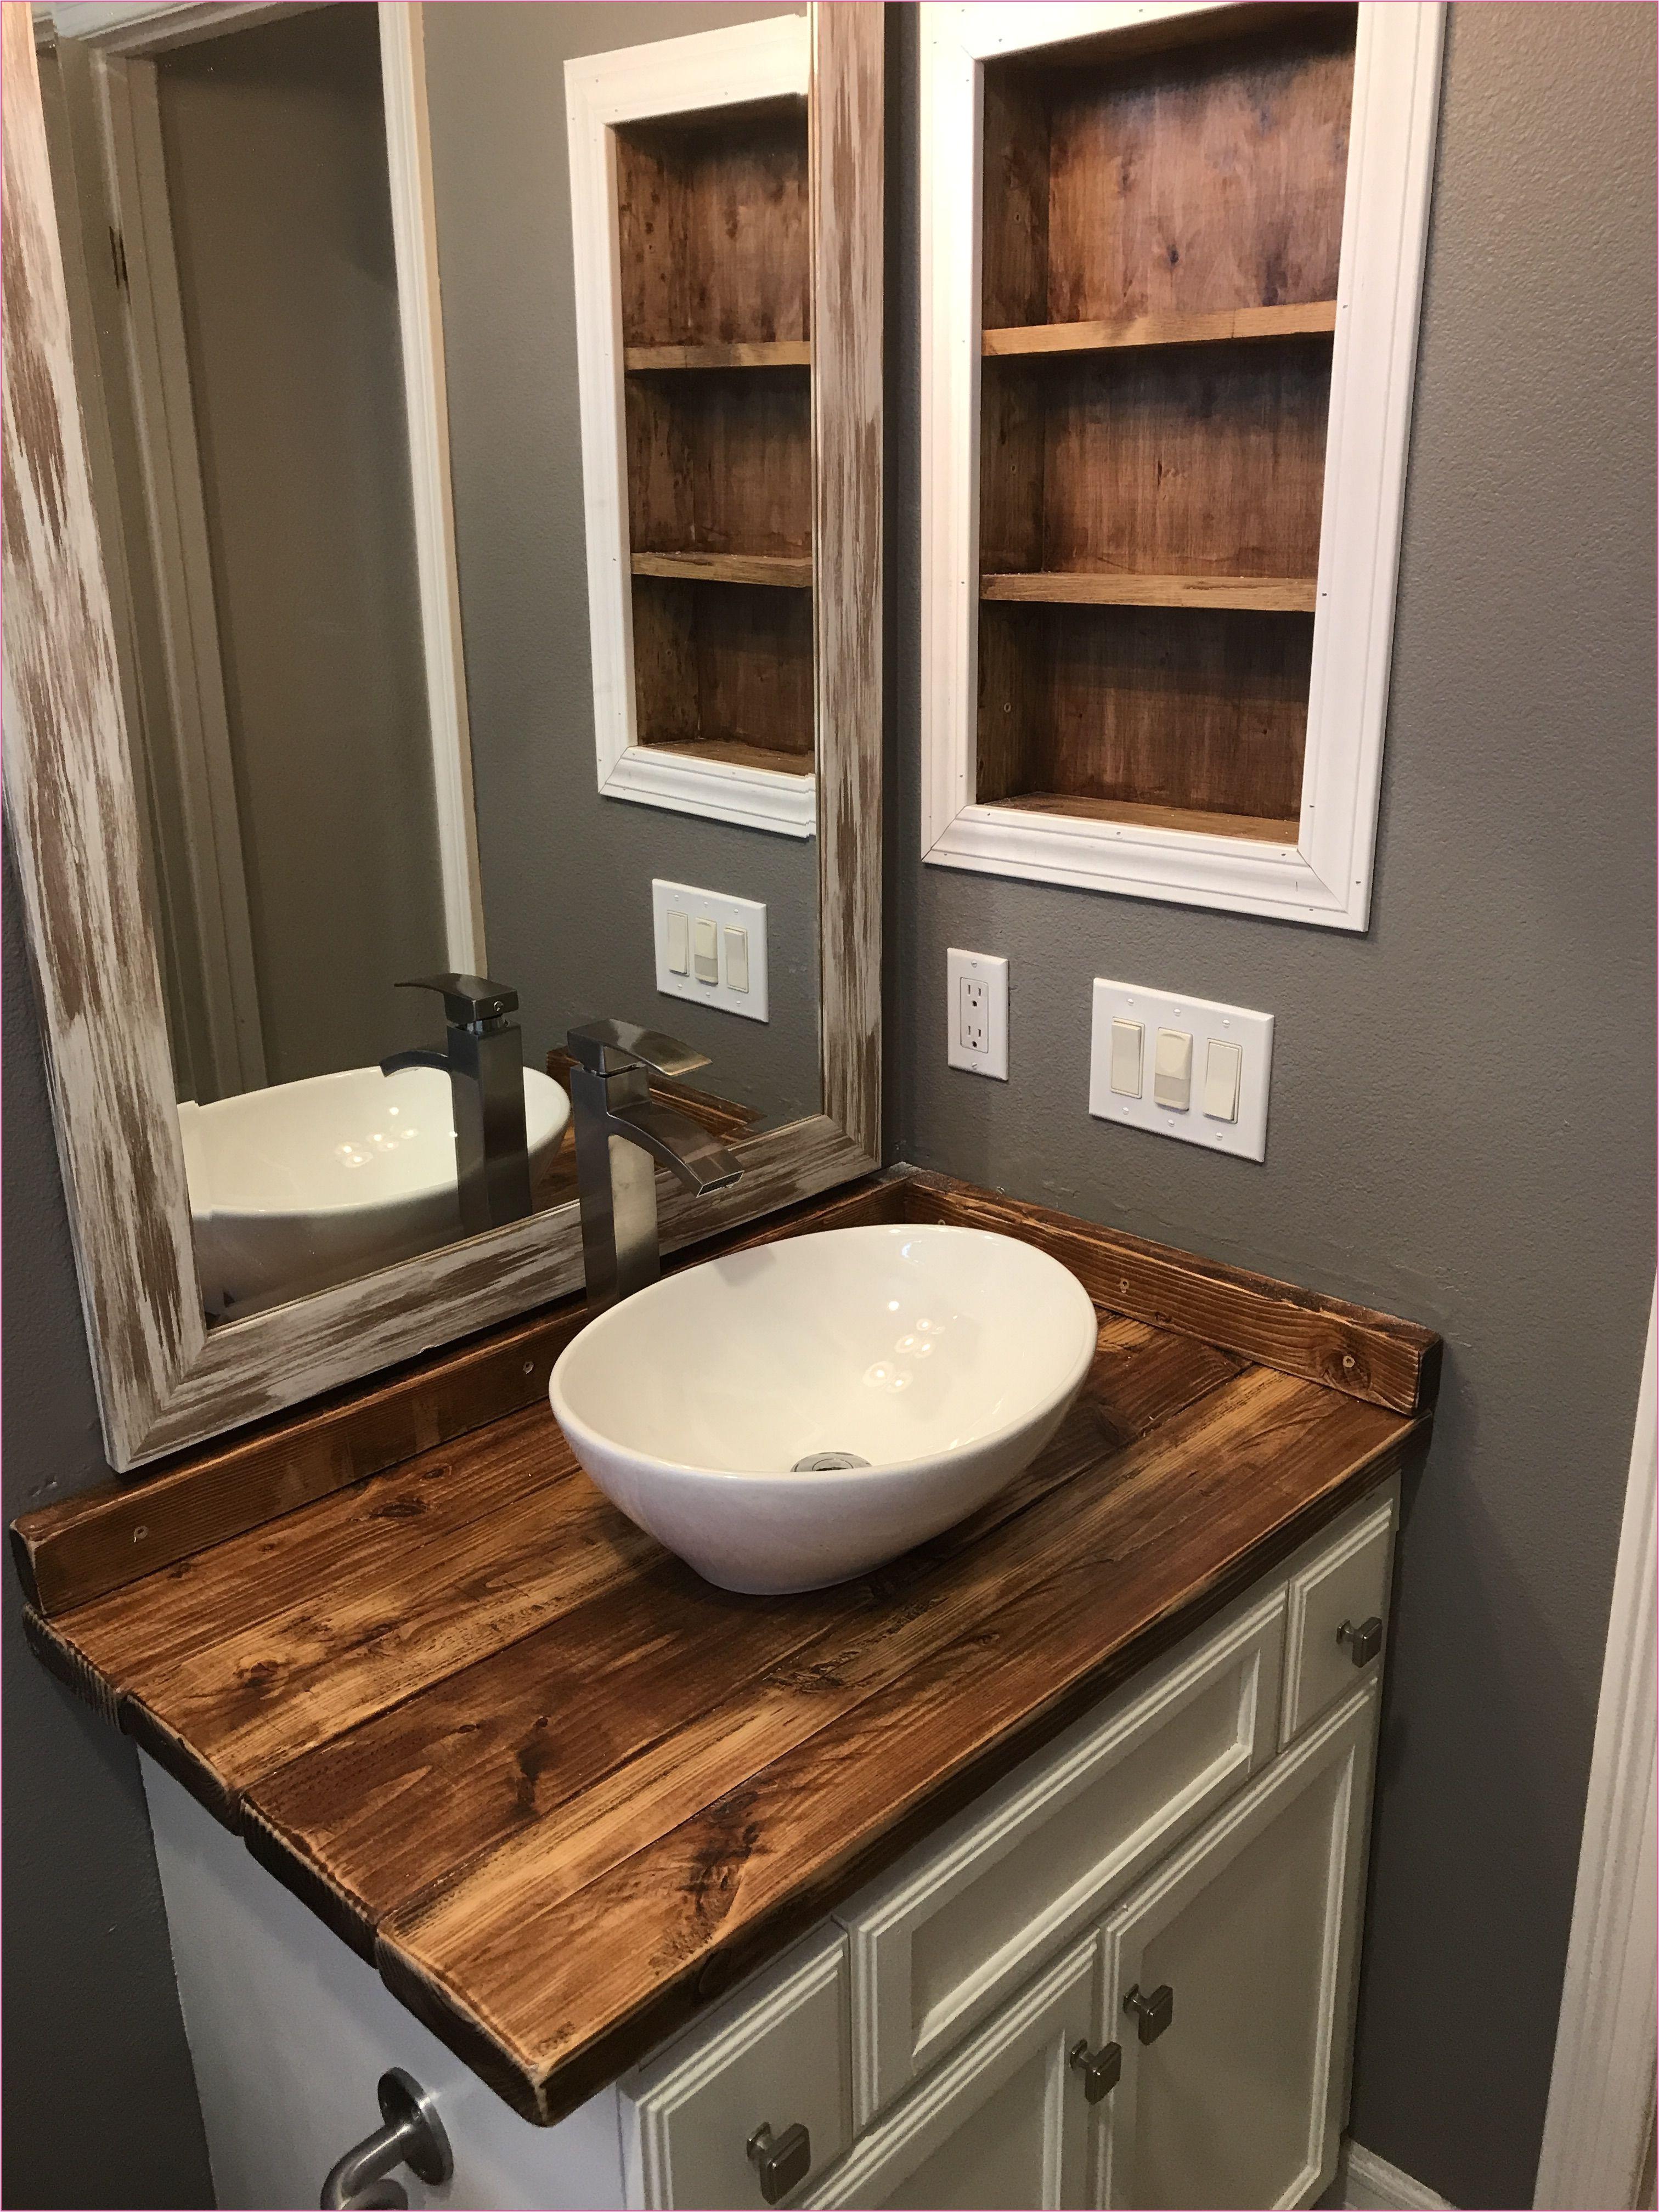 diy rustic wood countertop and vessel sink bathroom makeover bathroom rustic 36 inspirational shiplap in bathroom moisture